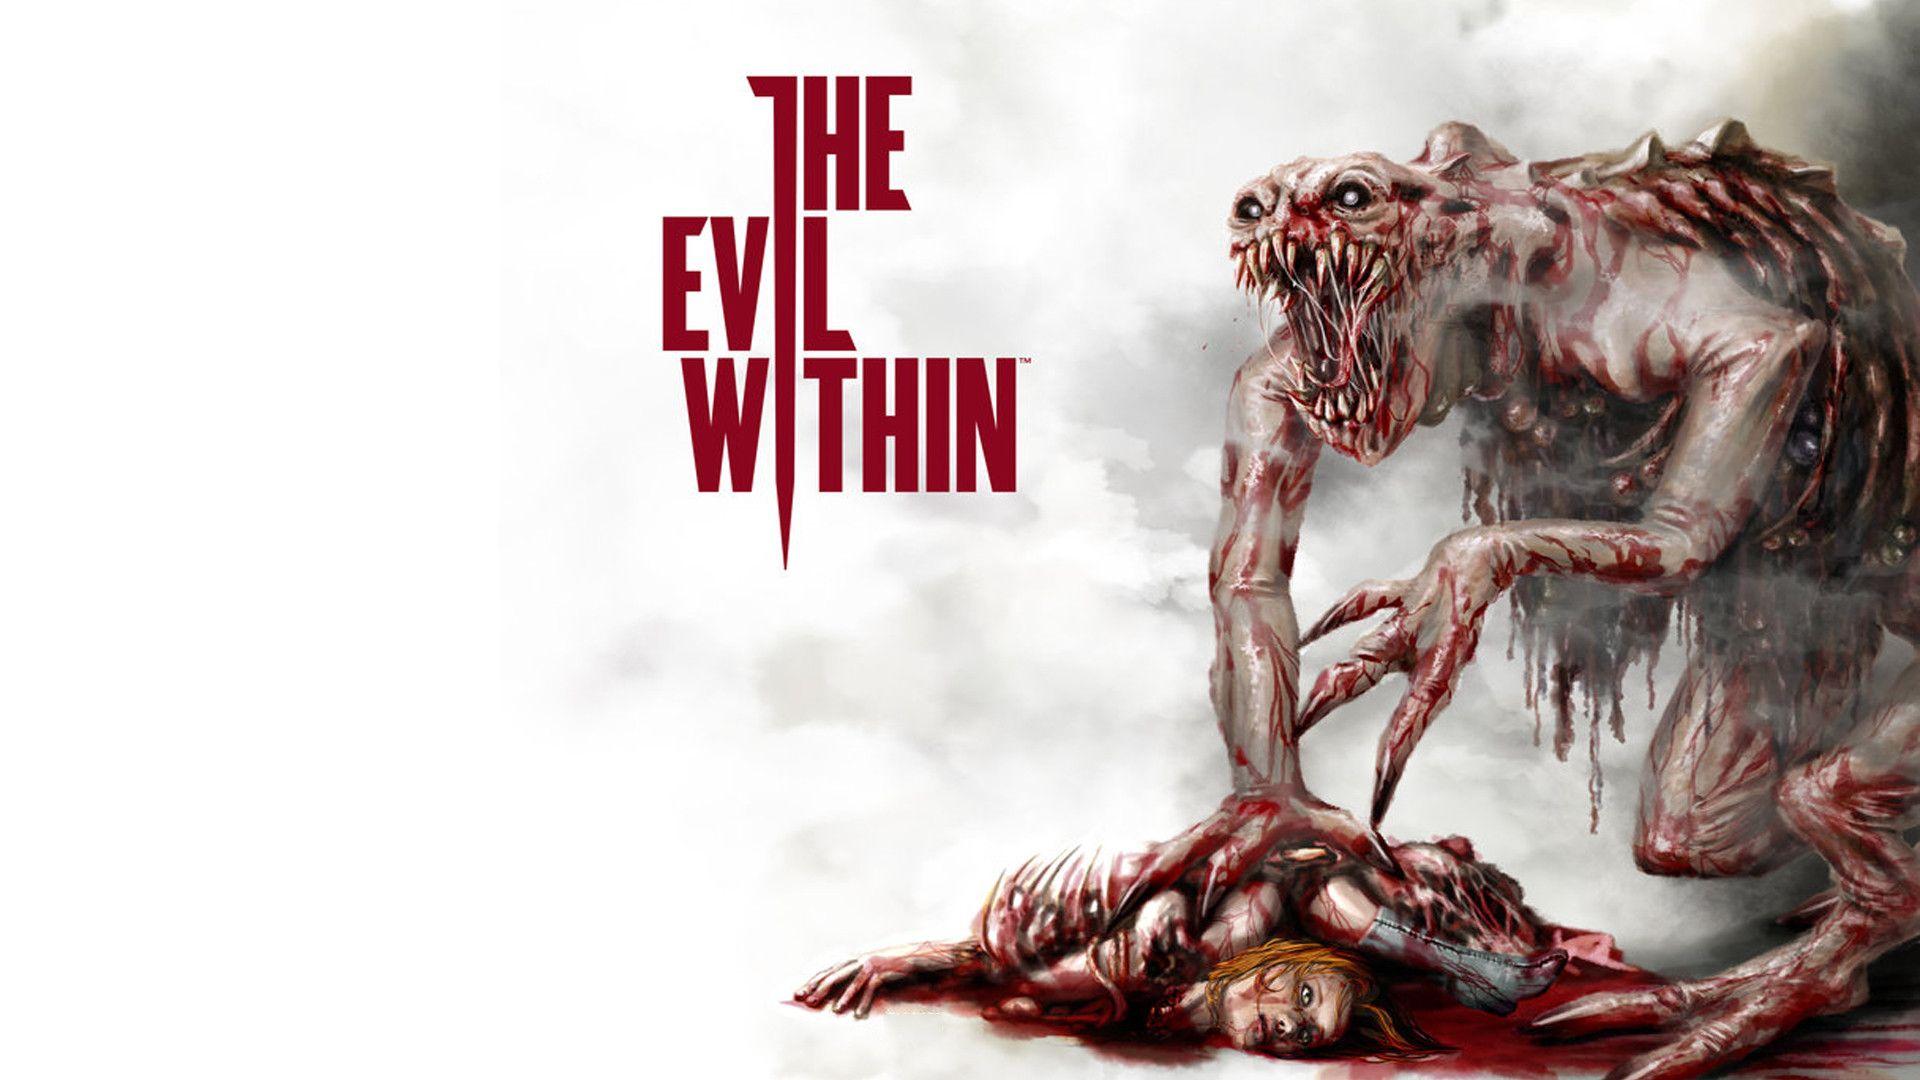 Wallpaper Theodore Harbinger The Evil Within 2 Hd: #TheEvilWithin #Zombies Para Más Información Sobre